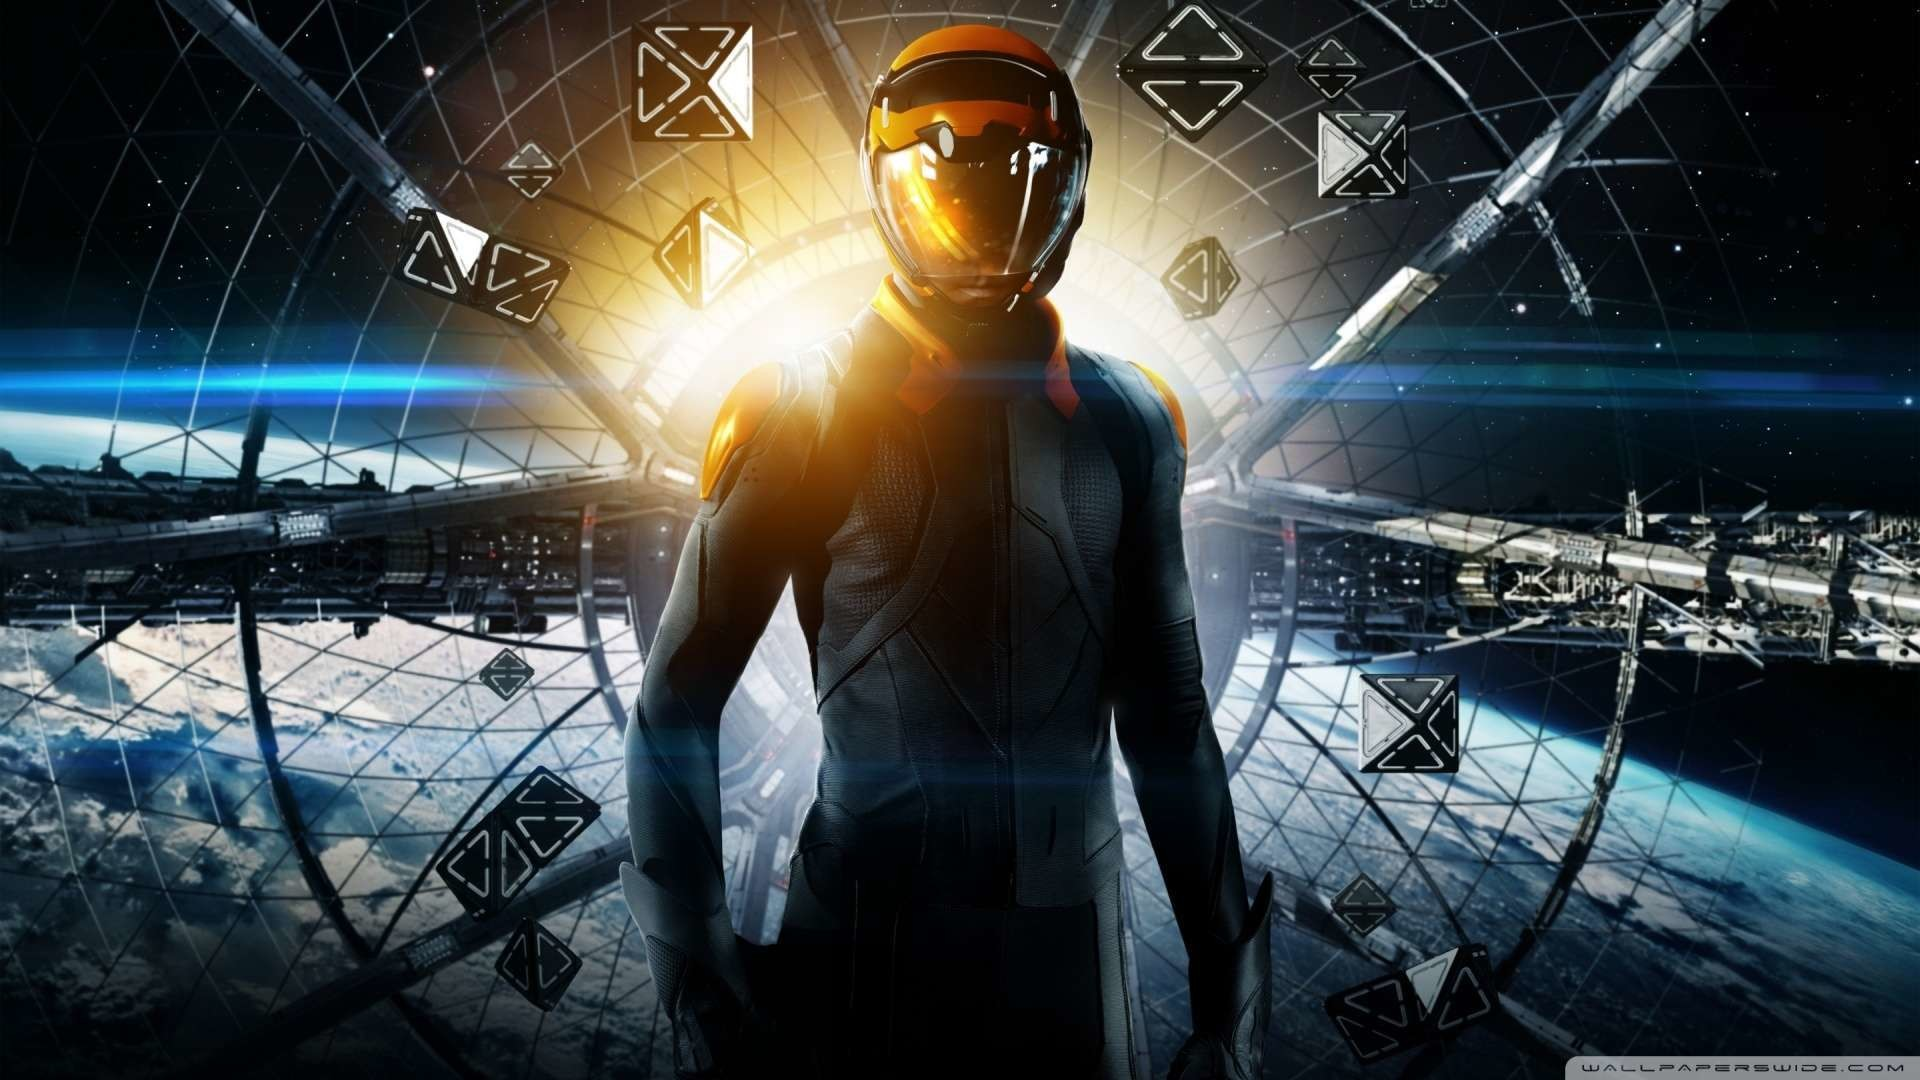 Download Enders Game 2013 Sci Fi Movie Wallpaper 1080p HD | HDWallWide .